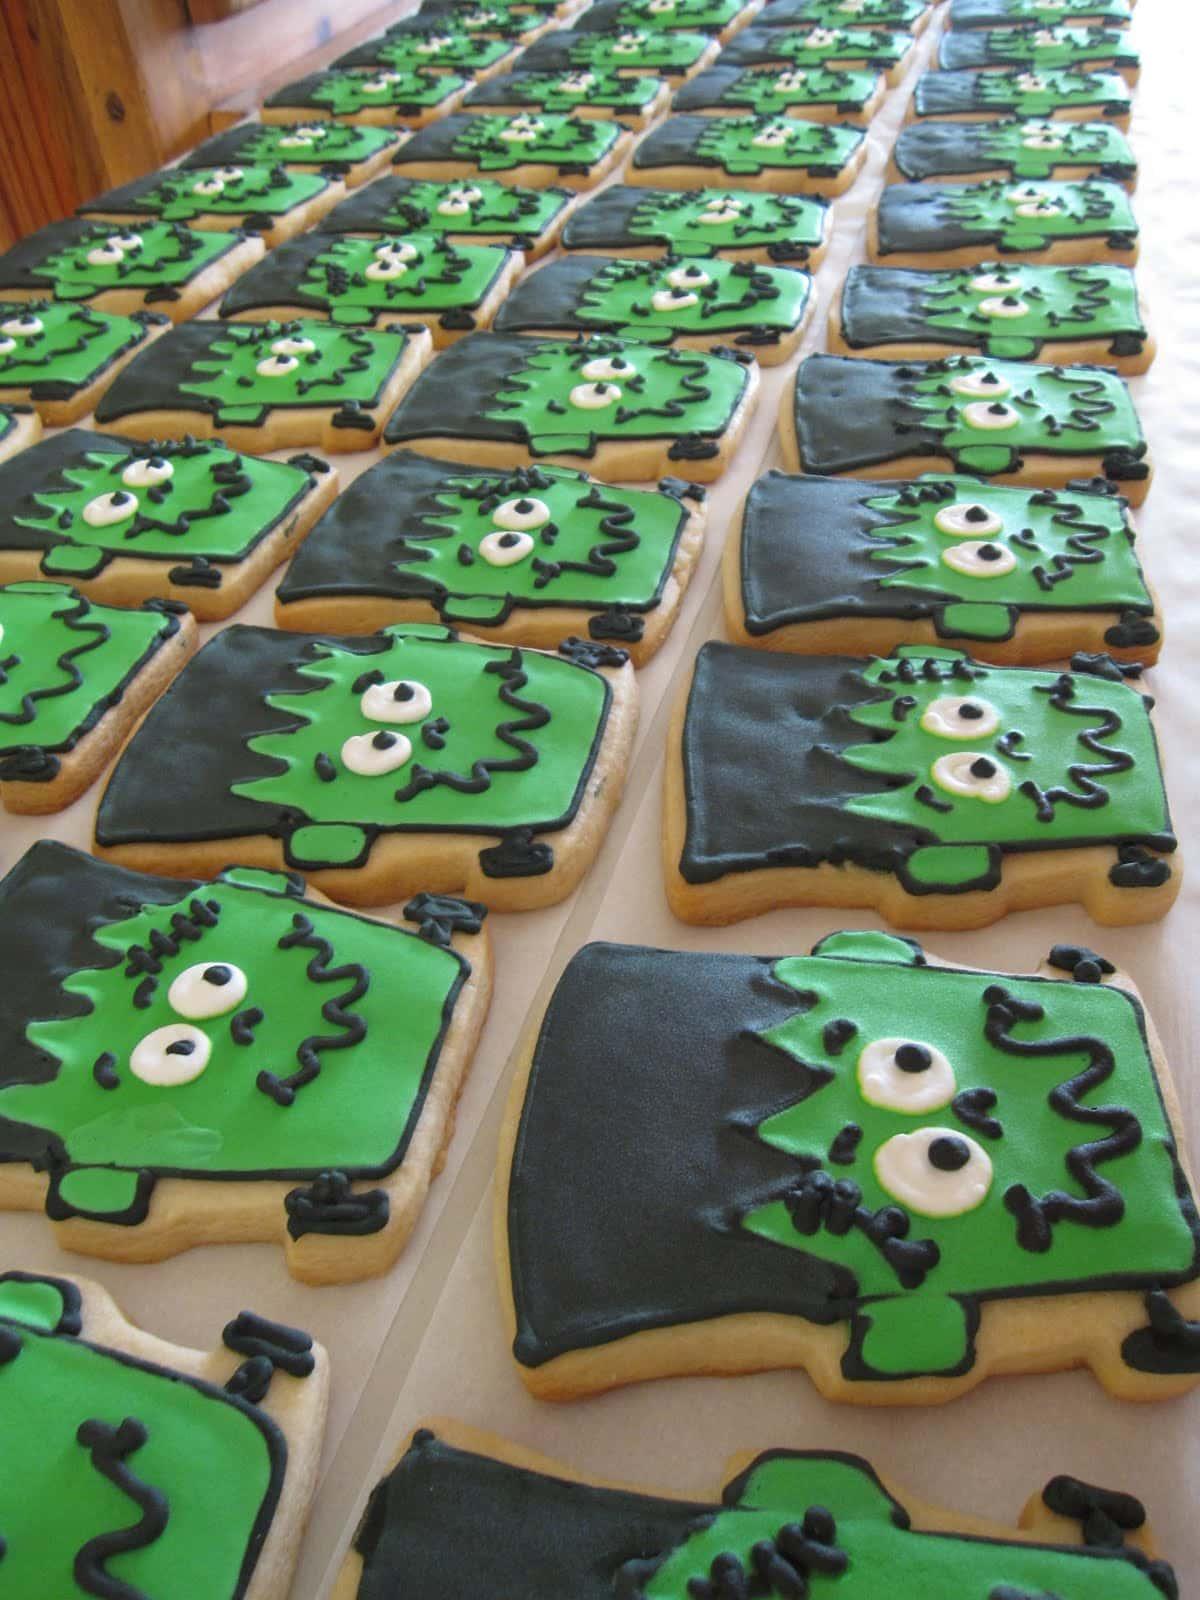 Dozens of Frankenstein decorated cookies in rows